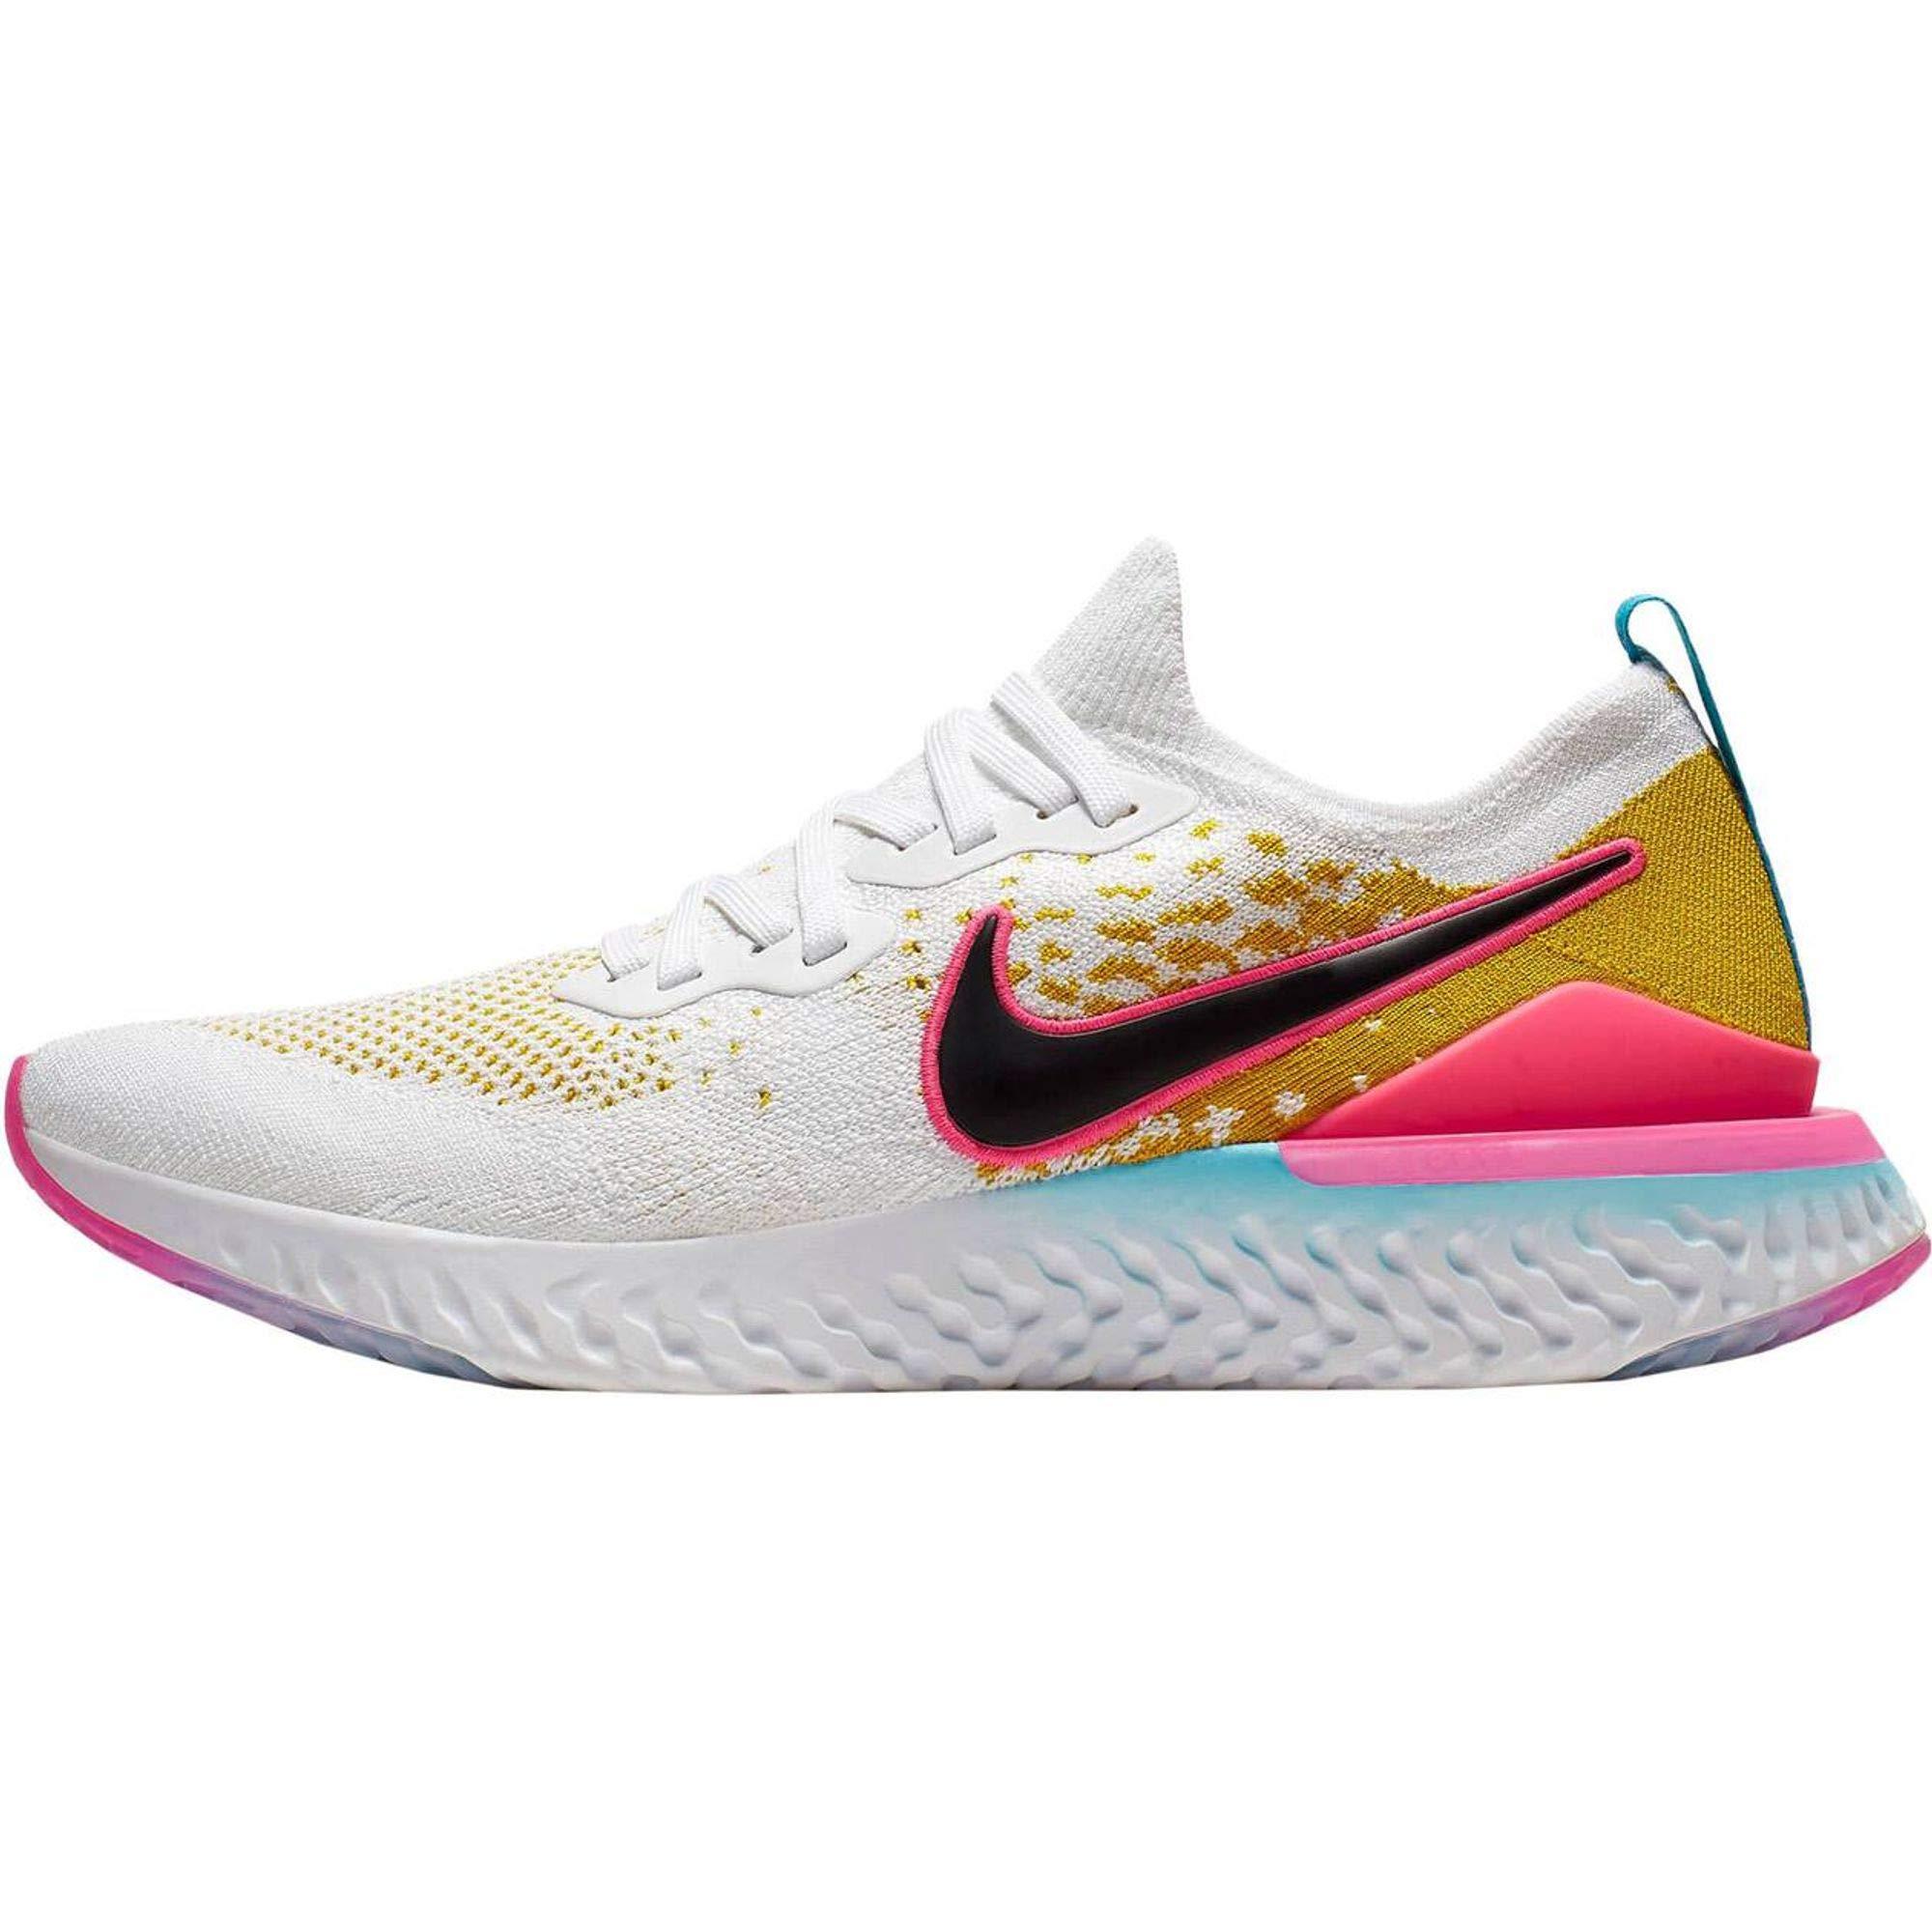 Nike Men's Shoes Epic React Flyknit 2